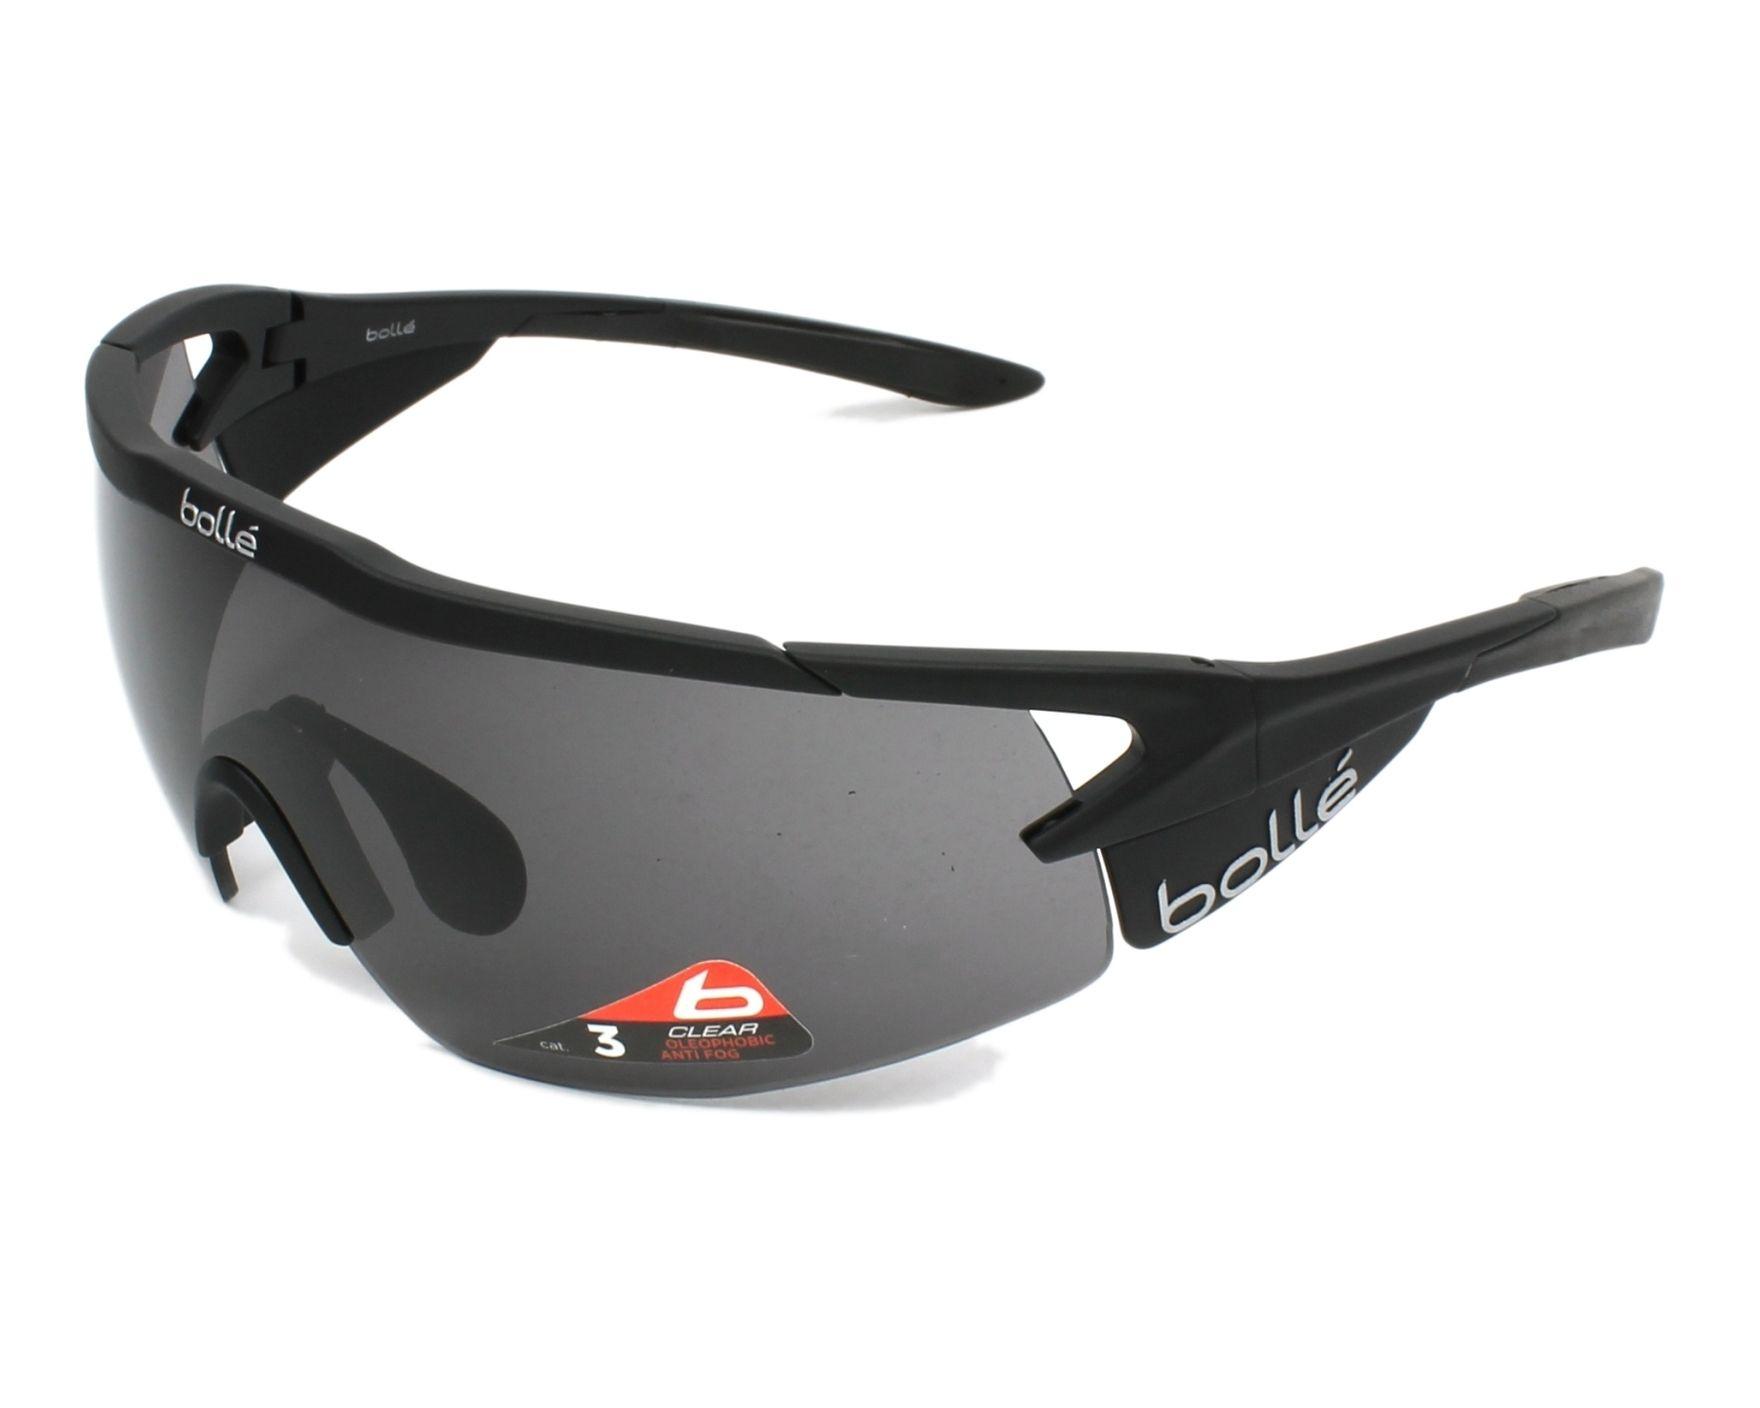 363dac086c Sunglasses Bollé AEROMAX 12266 - Black profile view